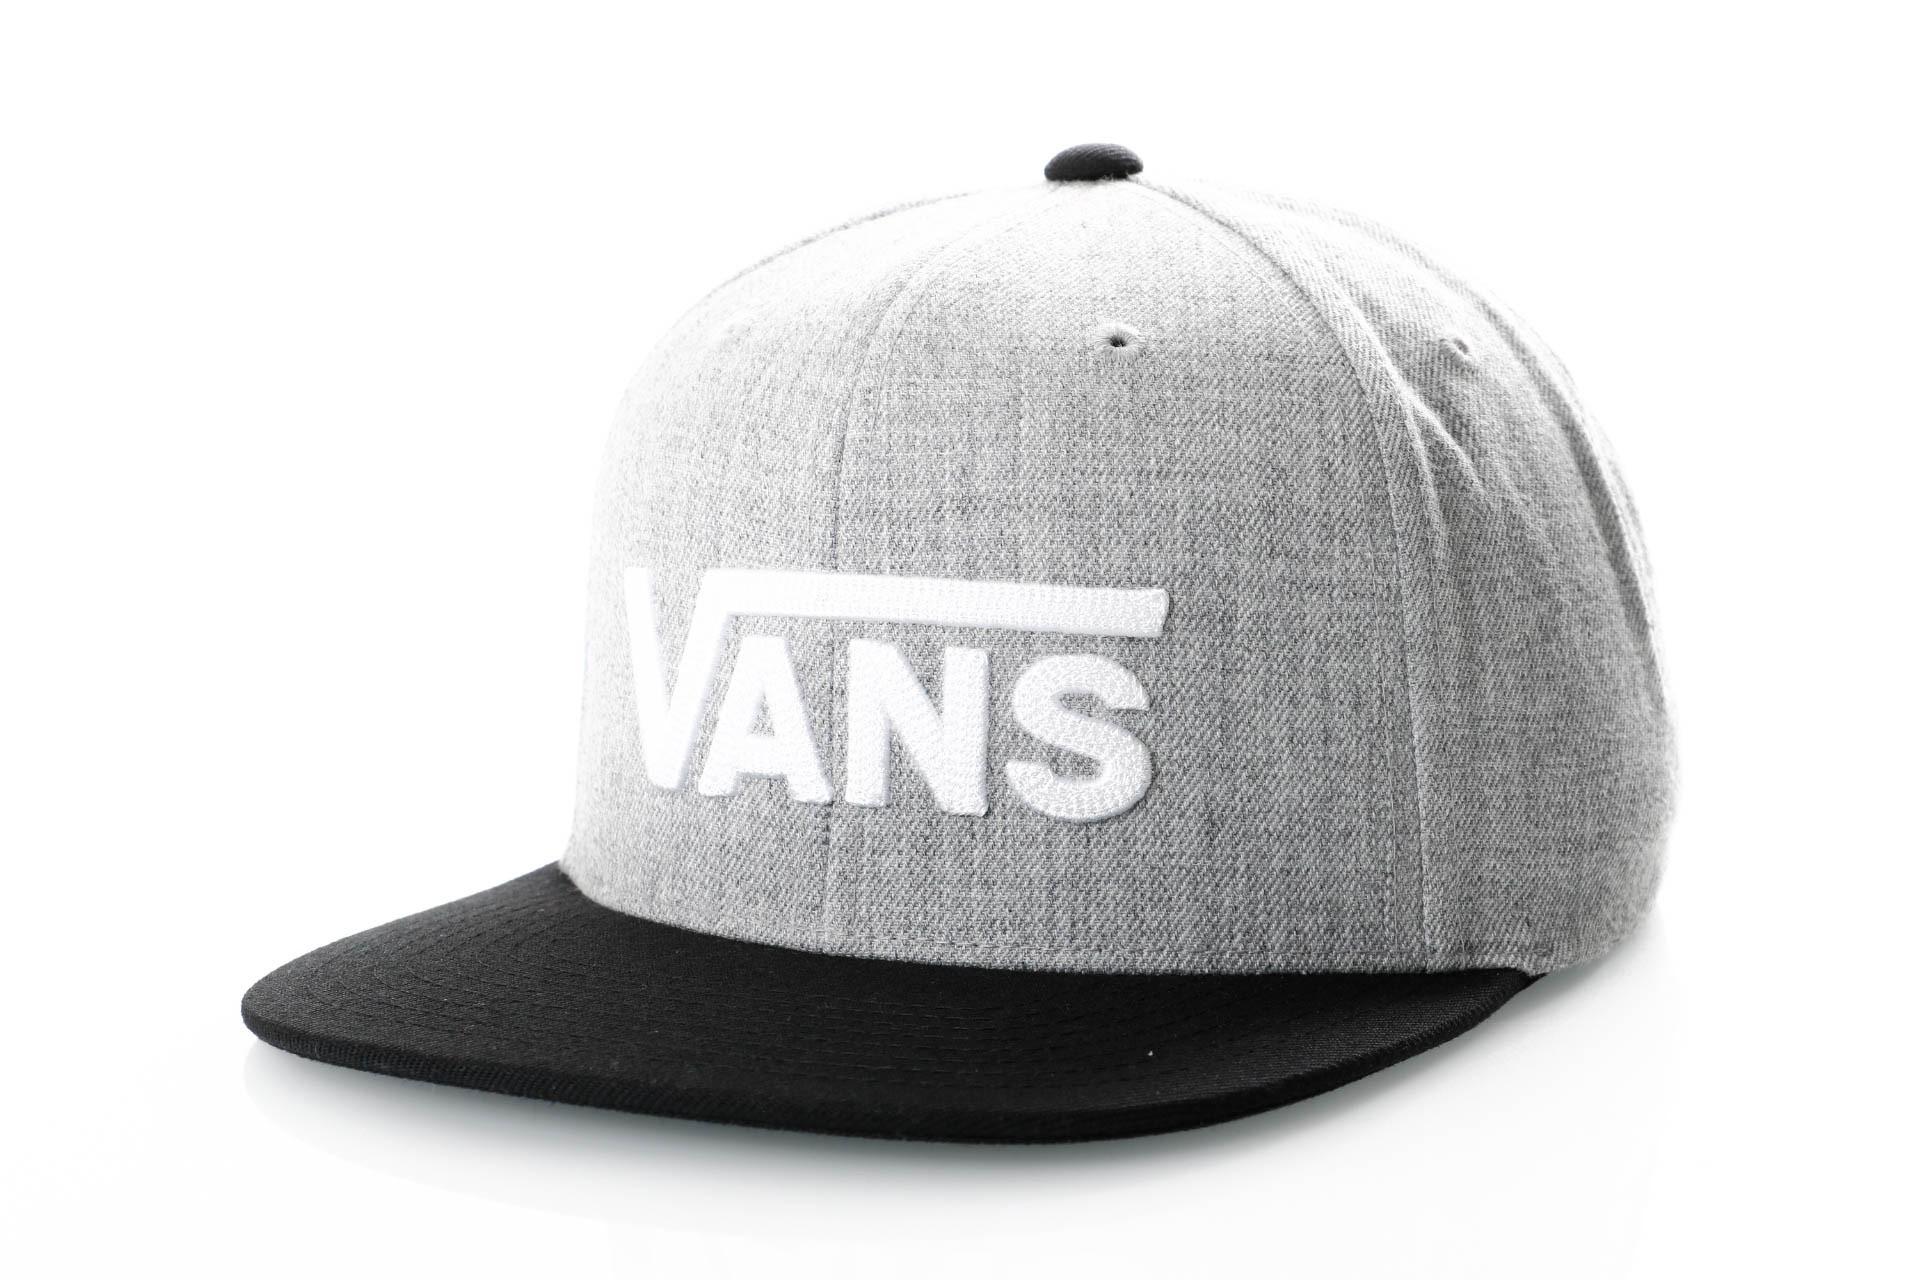 9cd92348941 Afbeelding van Vans DROP V II SNAPBACK VN0A36ORHGB Snapback cap HEATHER  GREY-BLACK